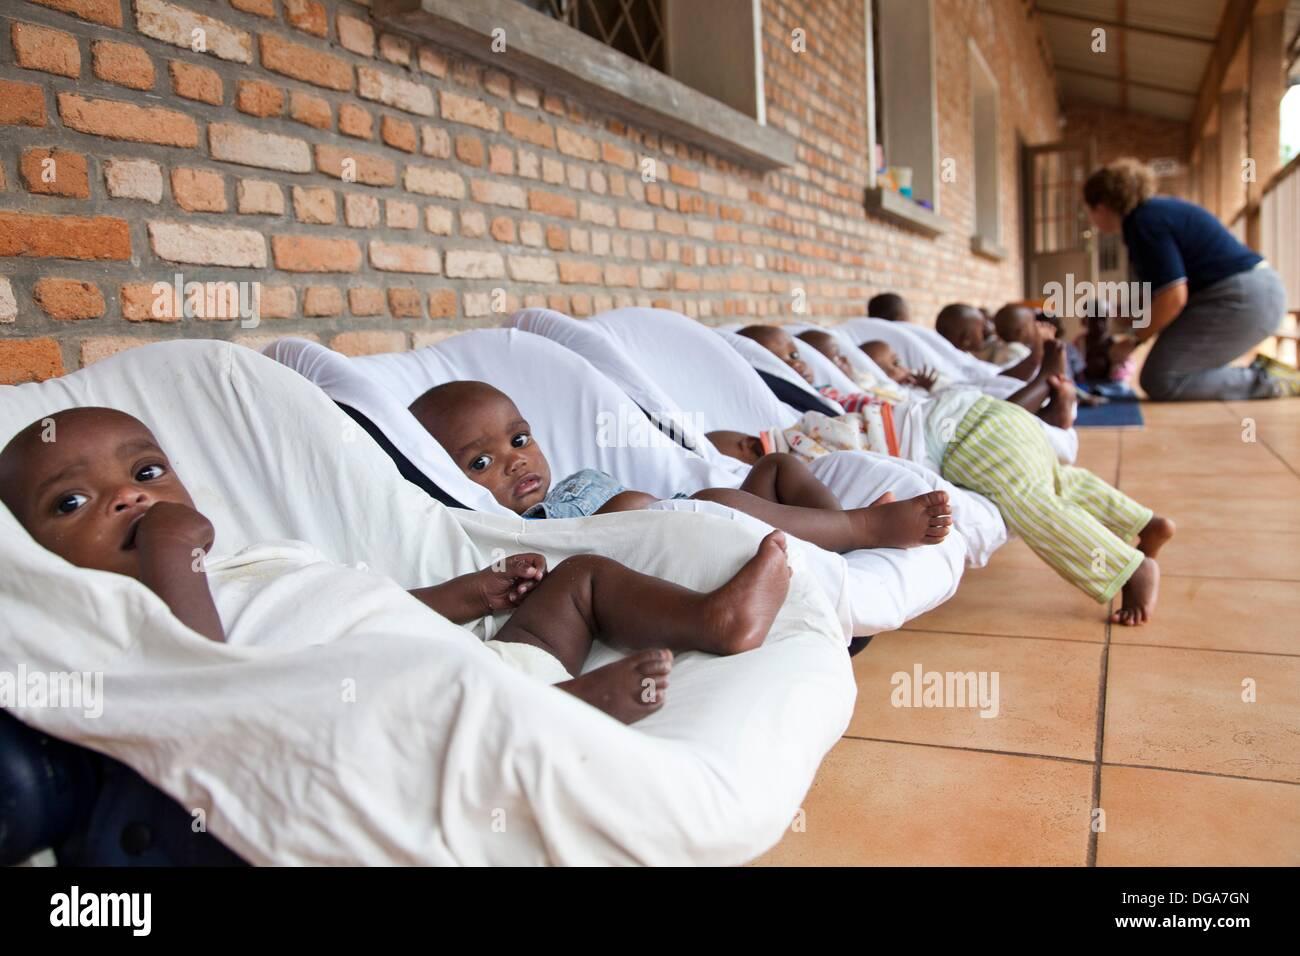 Burundi, Doctor who takes care of orphaned children - Stock Image